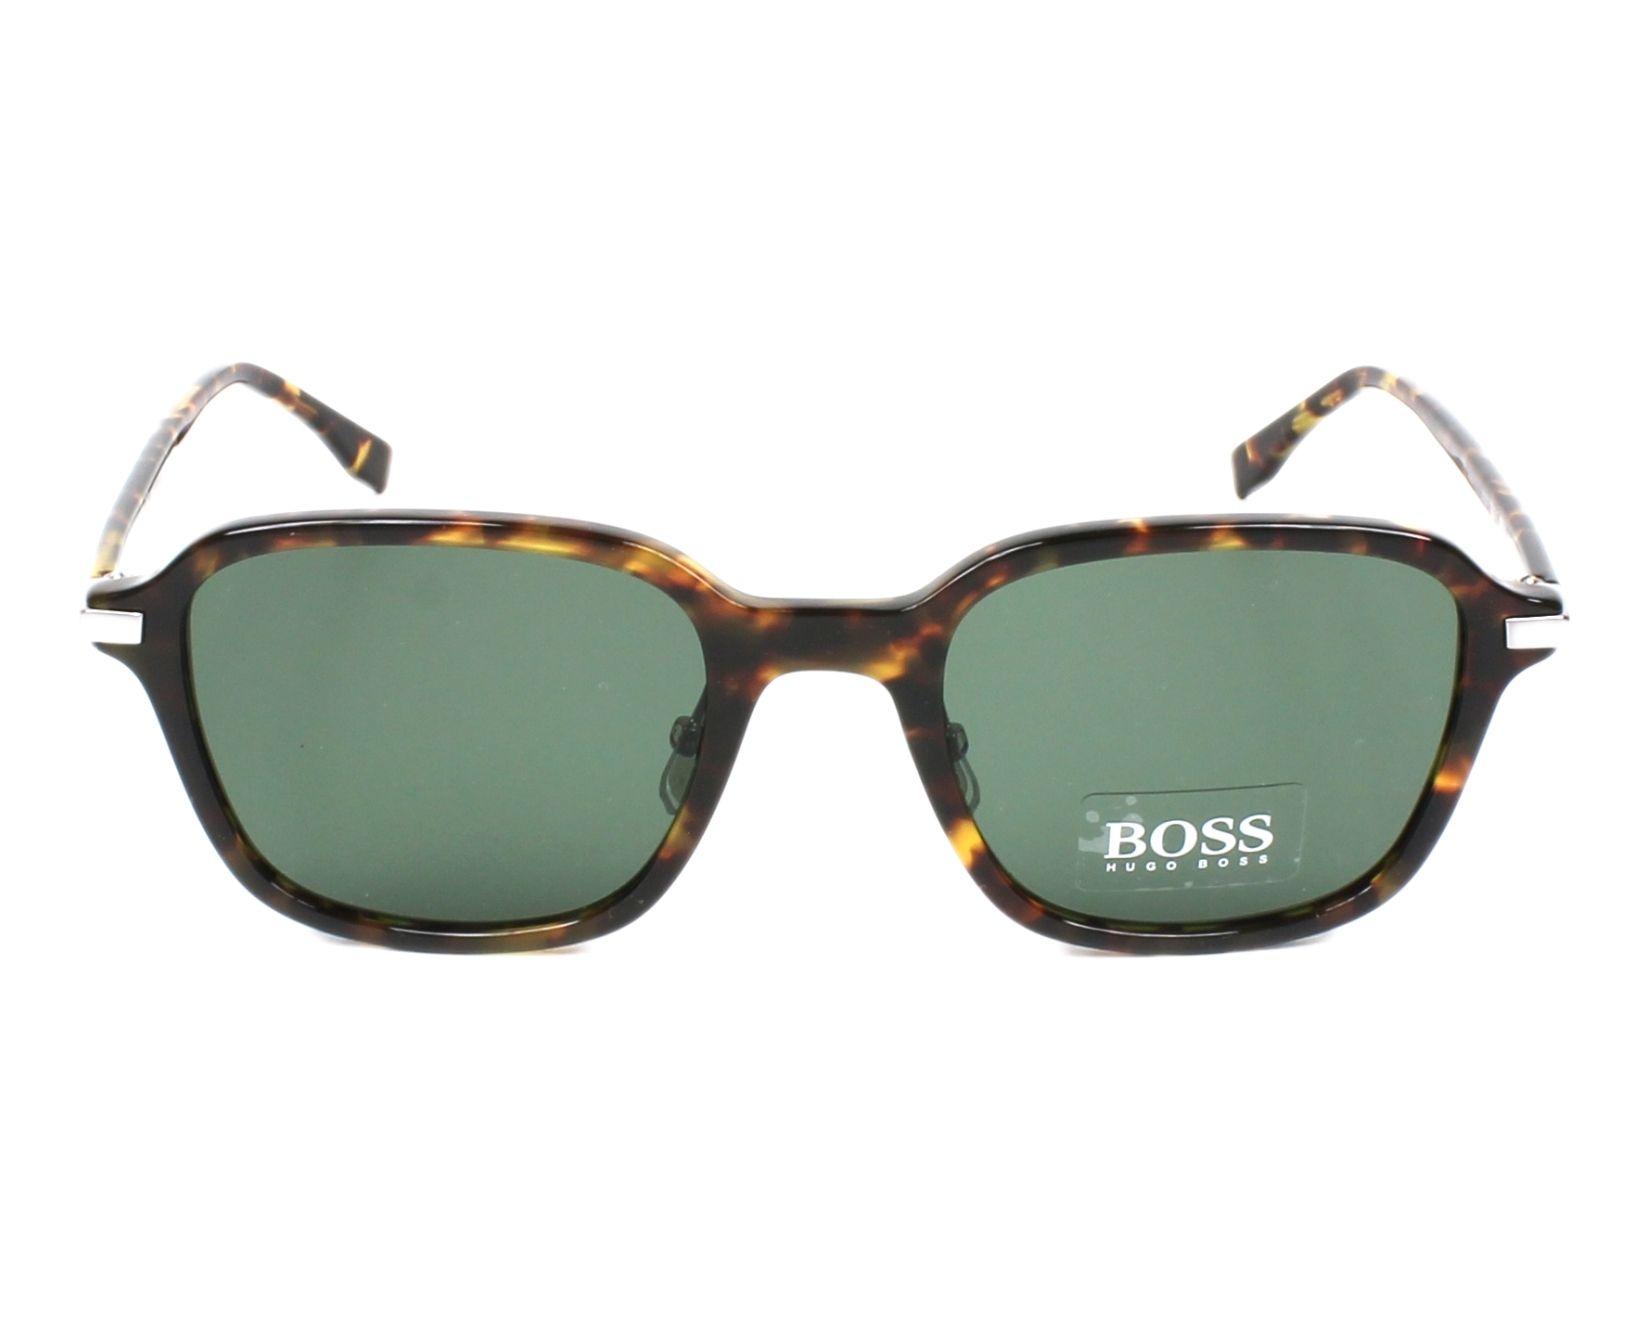 Boss 0909/s 1gf/85 51 Mm/21 Mm ySgDBunzrR